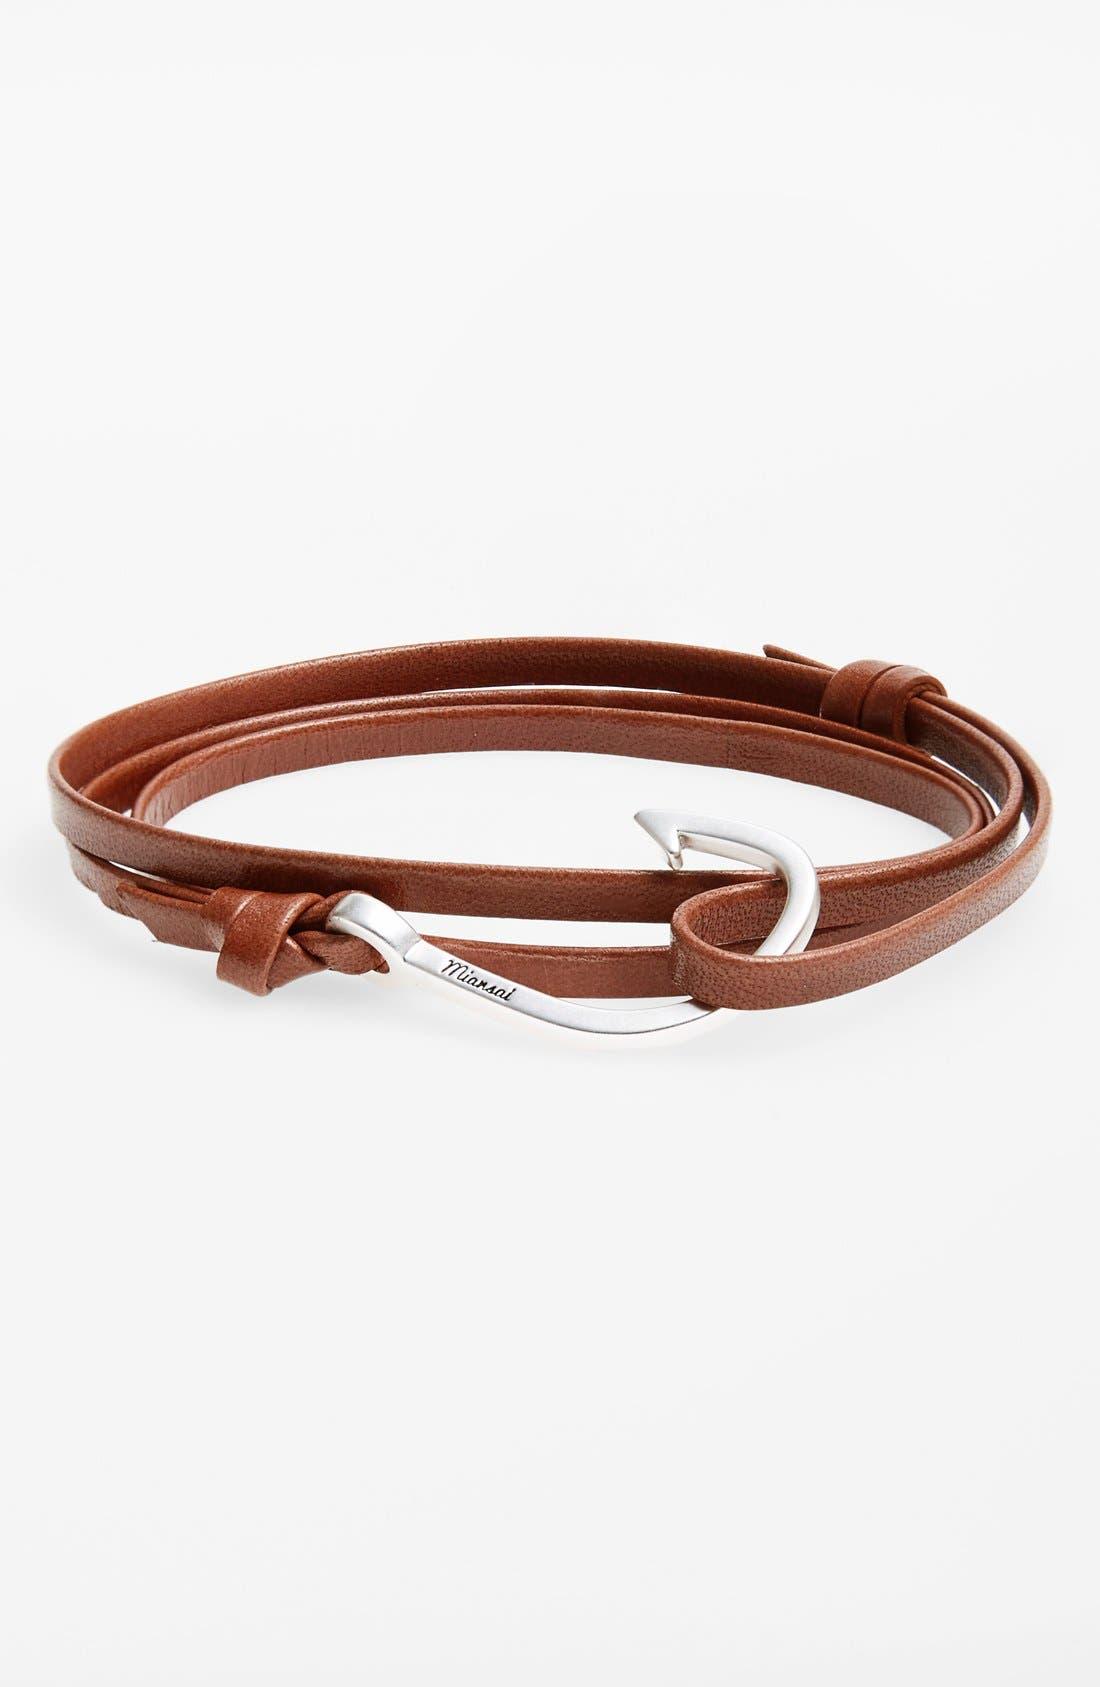 Silver Hook Leather Bracelet,                         Main,                         color, Brown